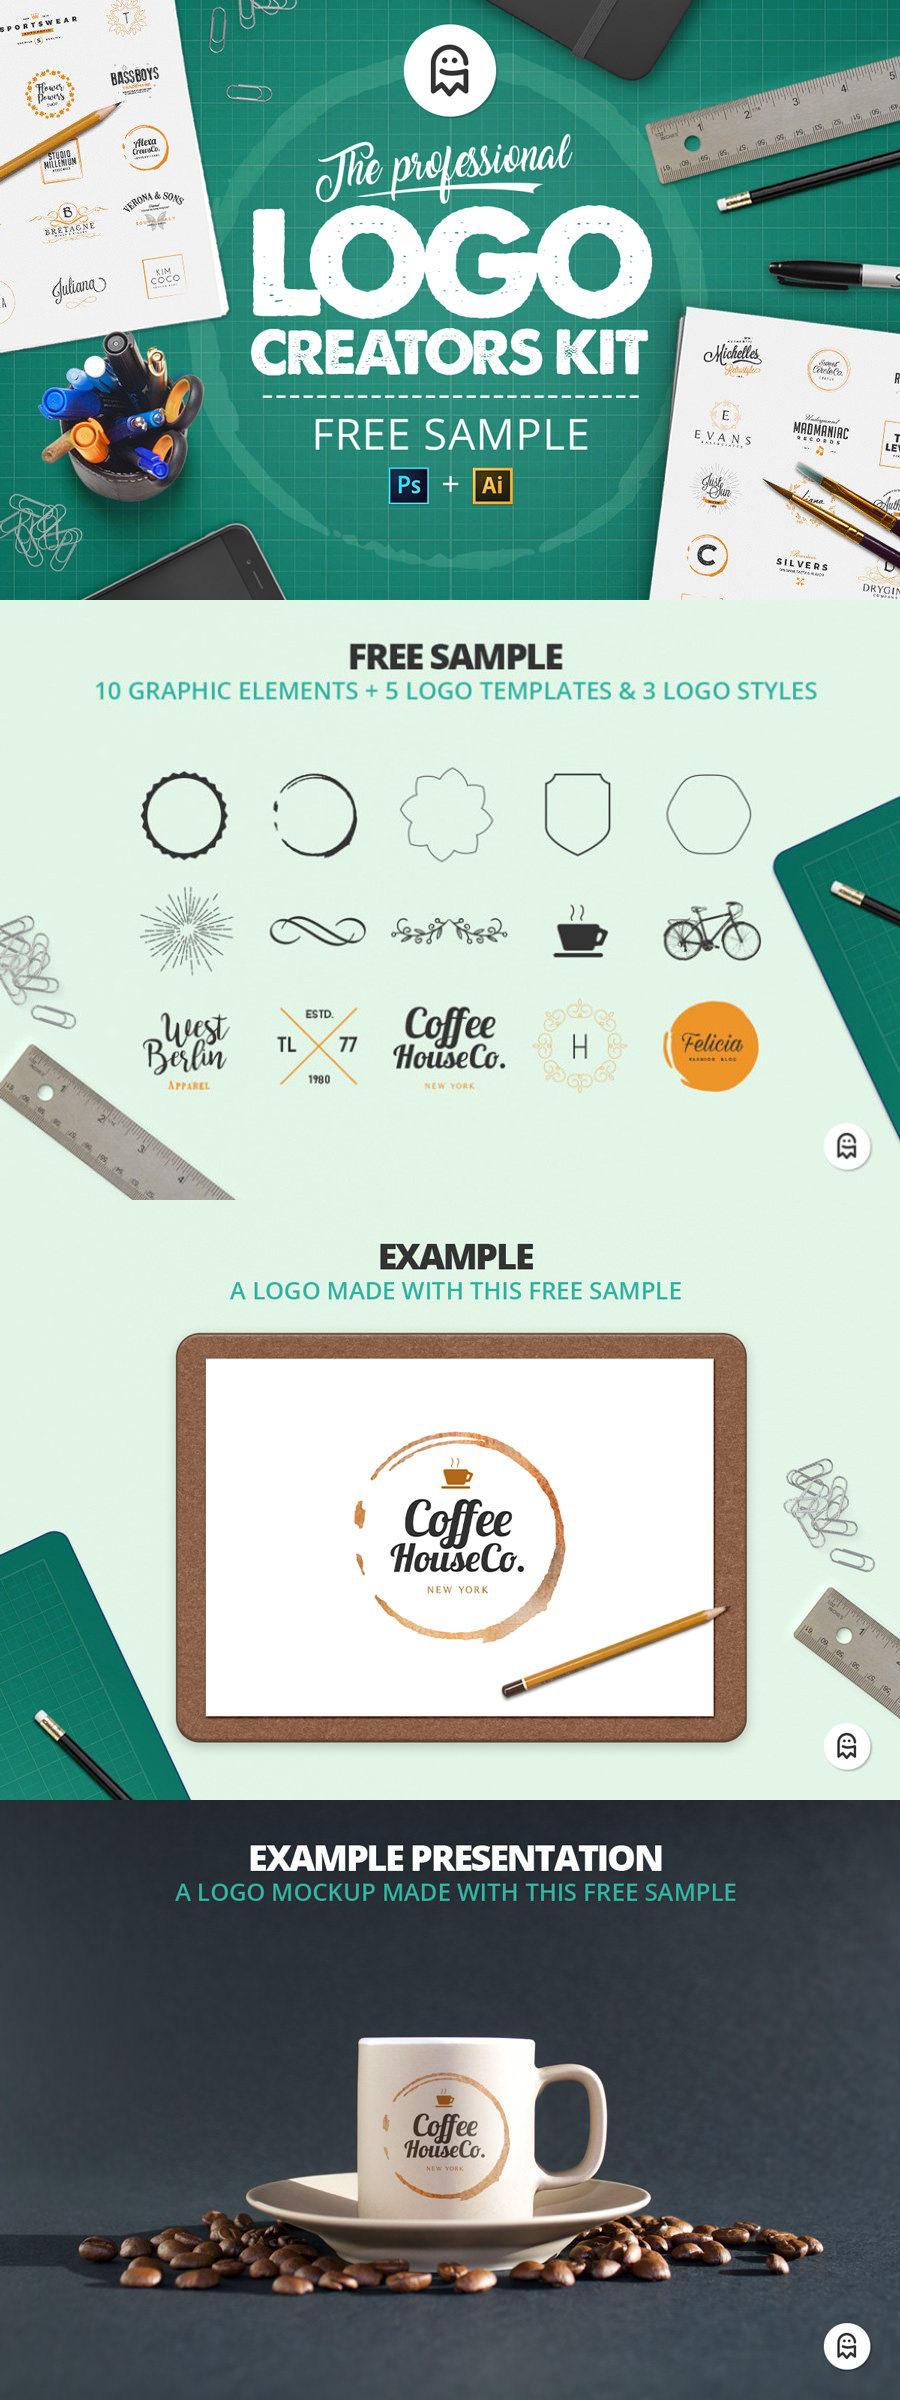 The Professional Logo Creators Kit Free Sample